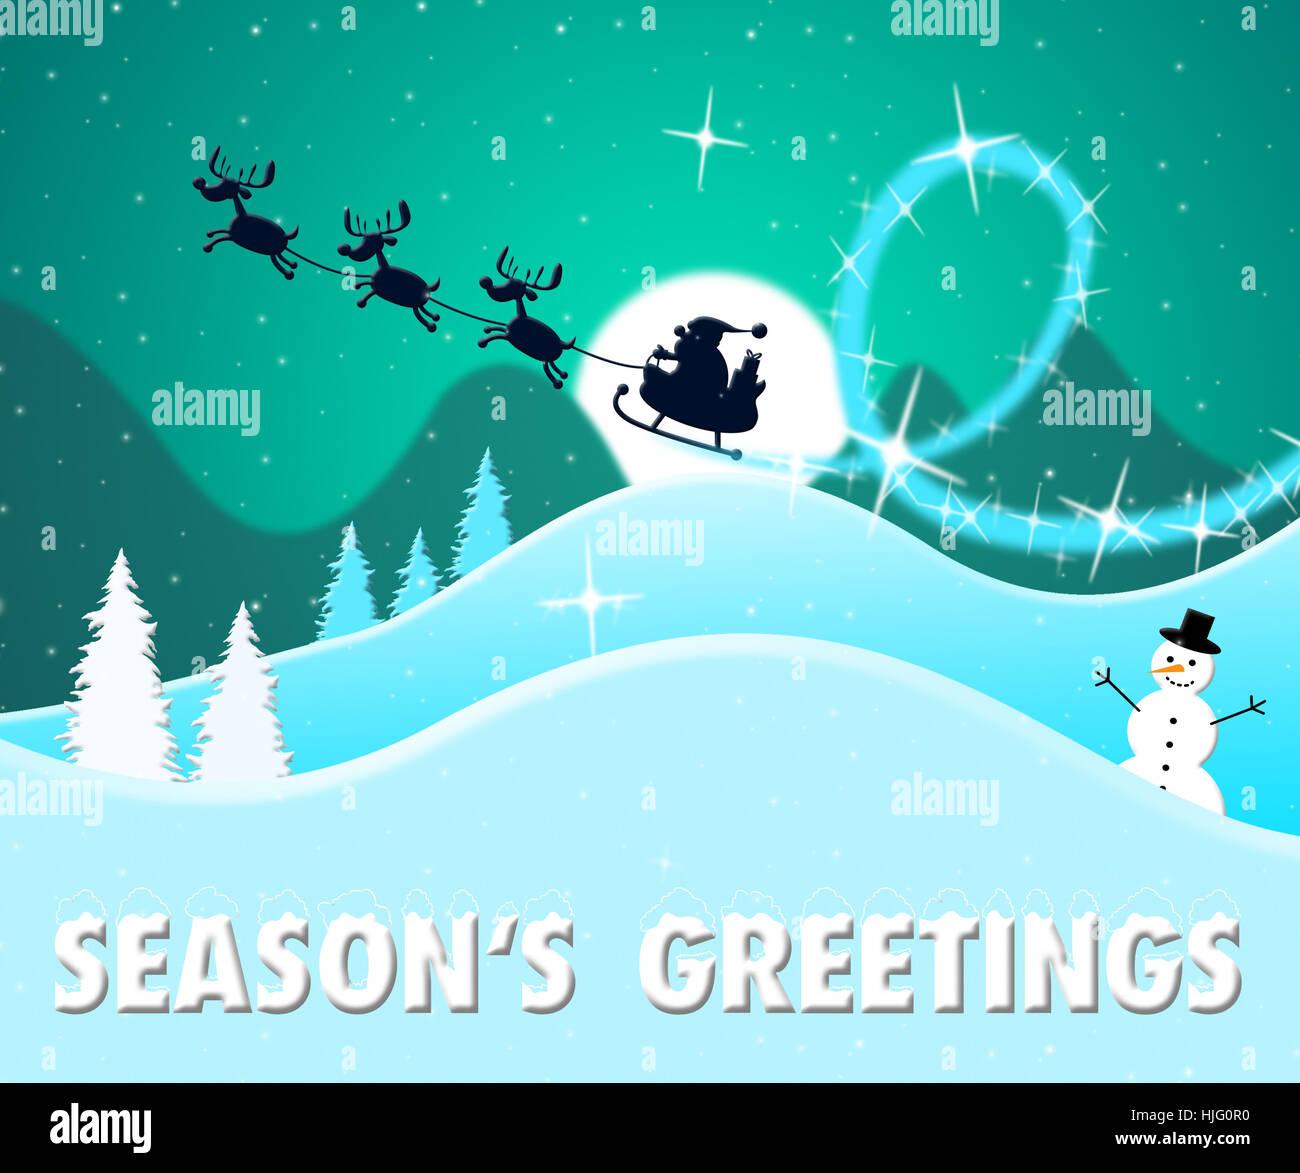 Seasons greetings santa scene shows happy christmas 3d illustration seasons greetings santa scene shows happy christmas 3d illustration m4hsunfo